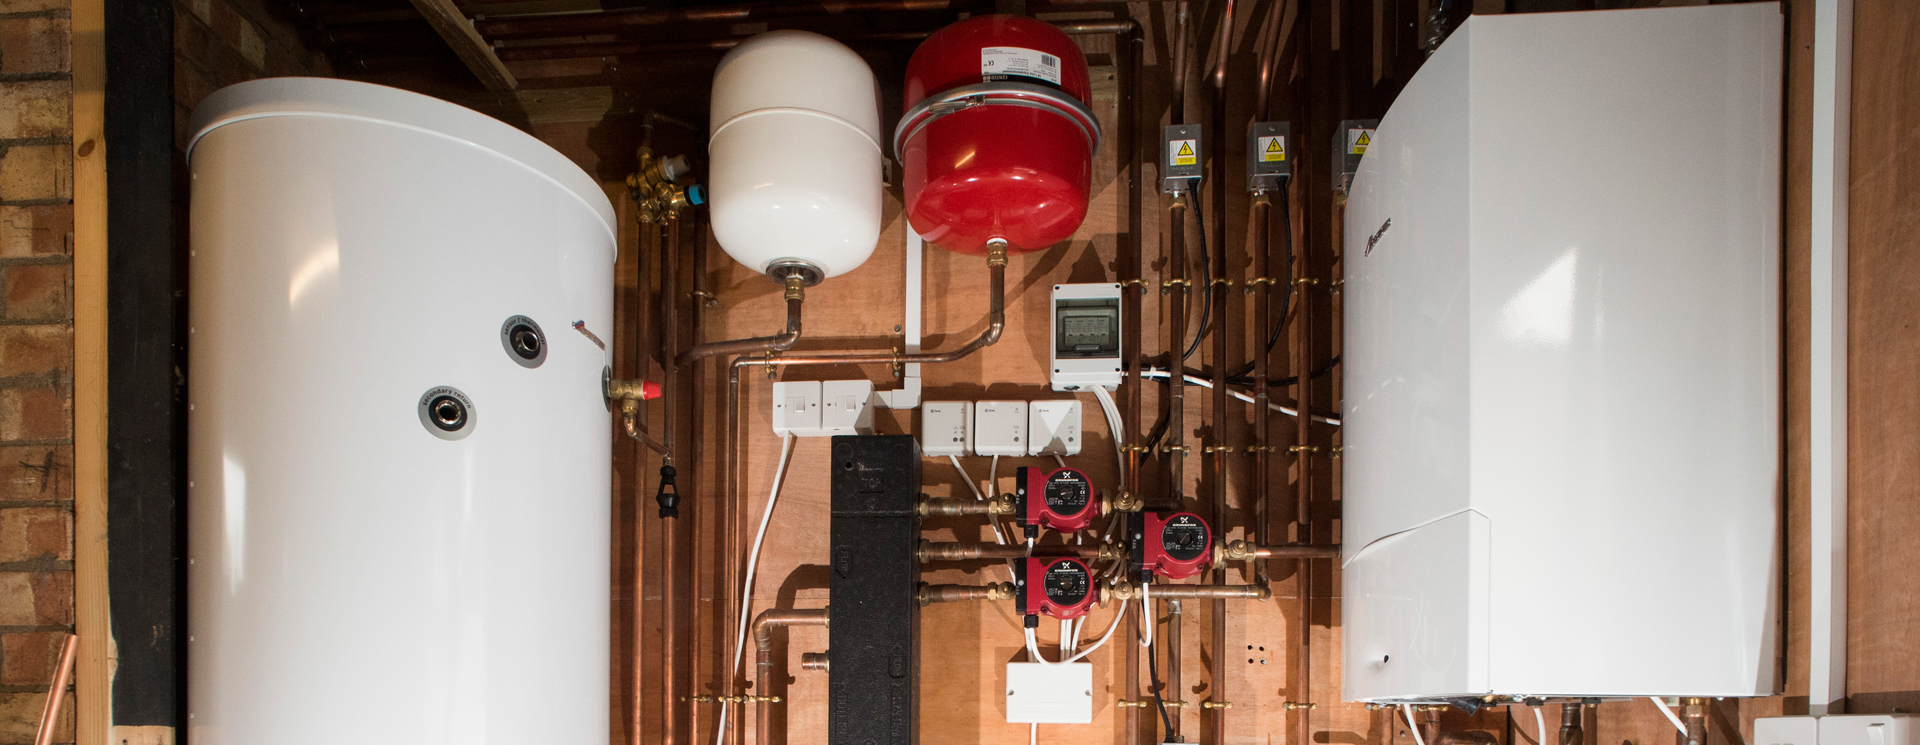 Heating Installations